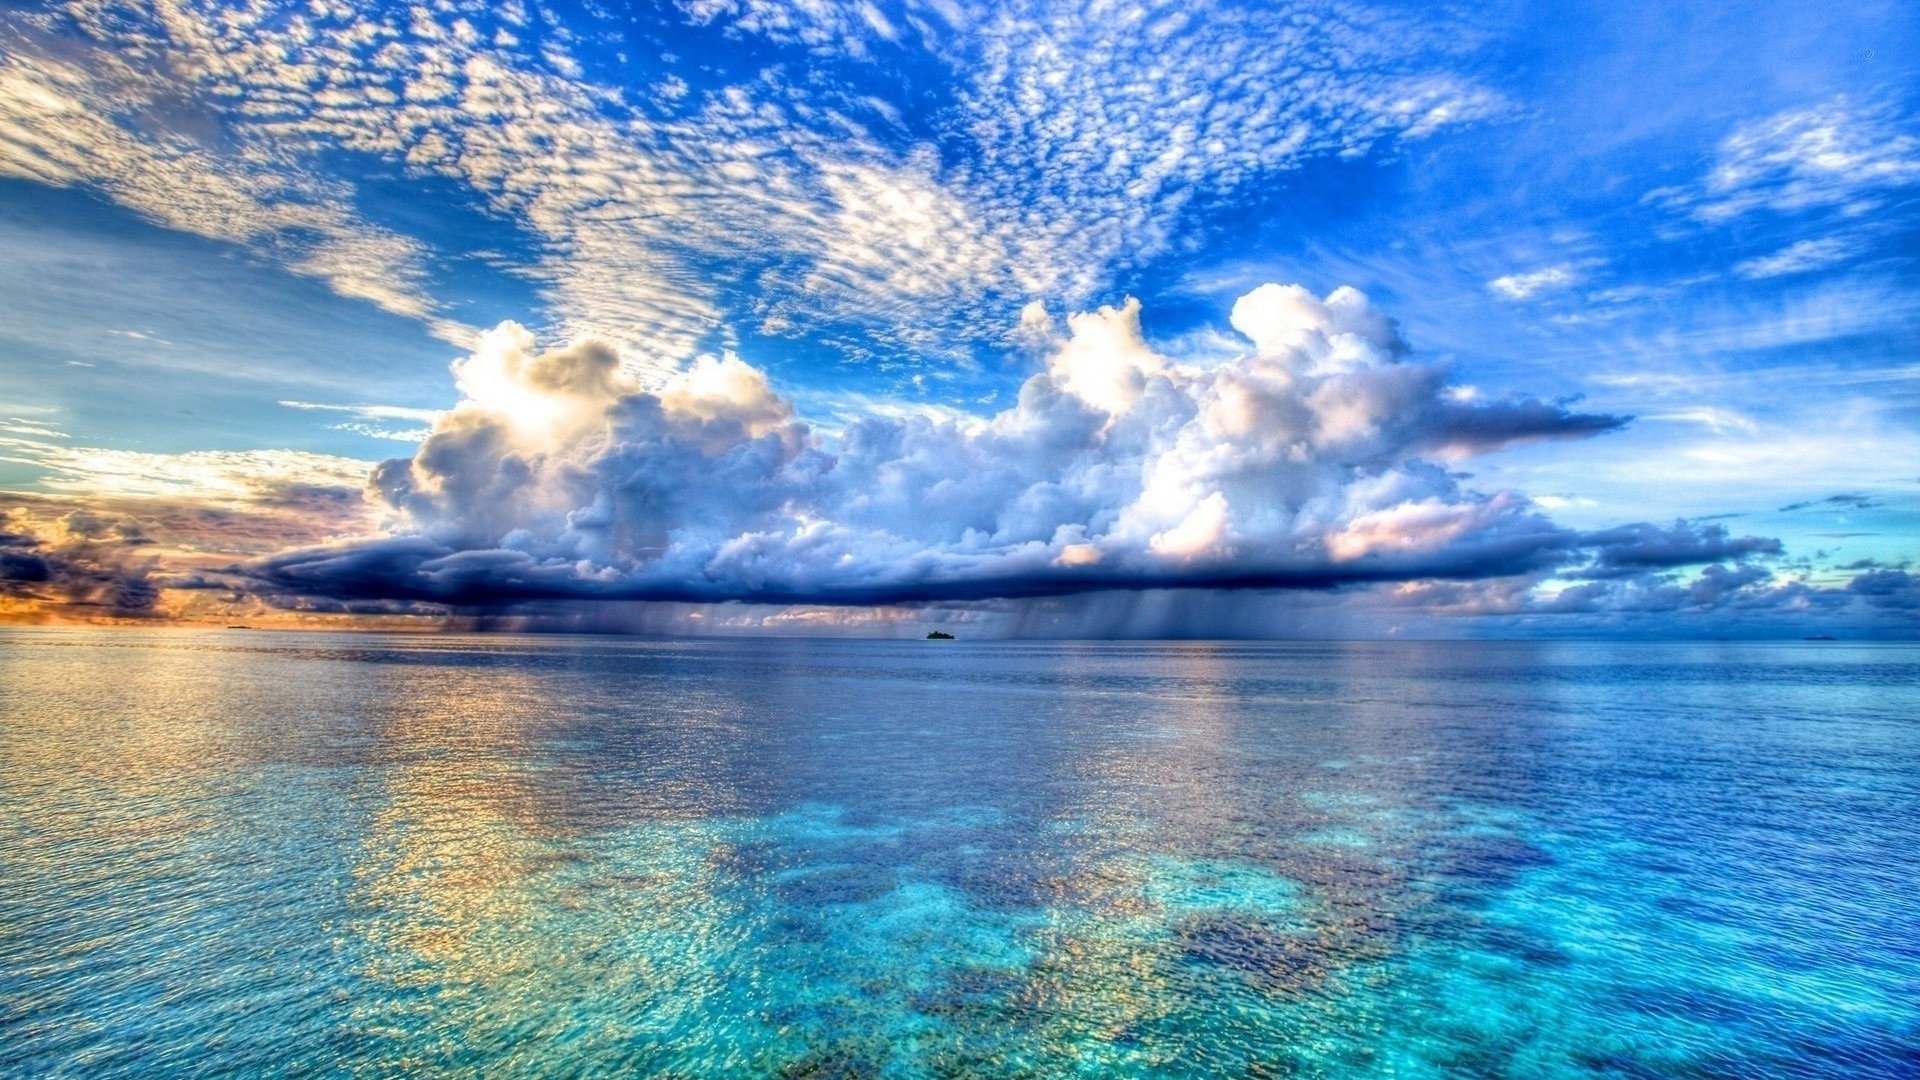 Rain clouds over the sea Mac Wallpaper Download | Free Mac Wallpapers